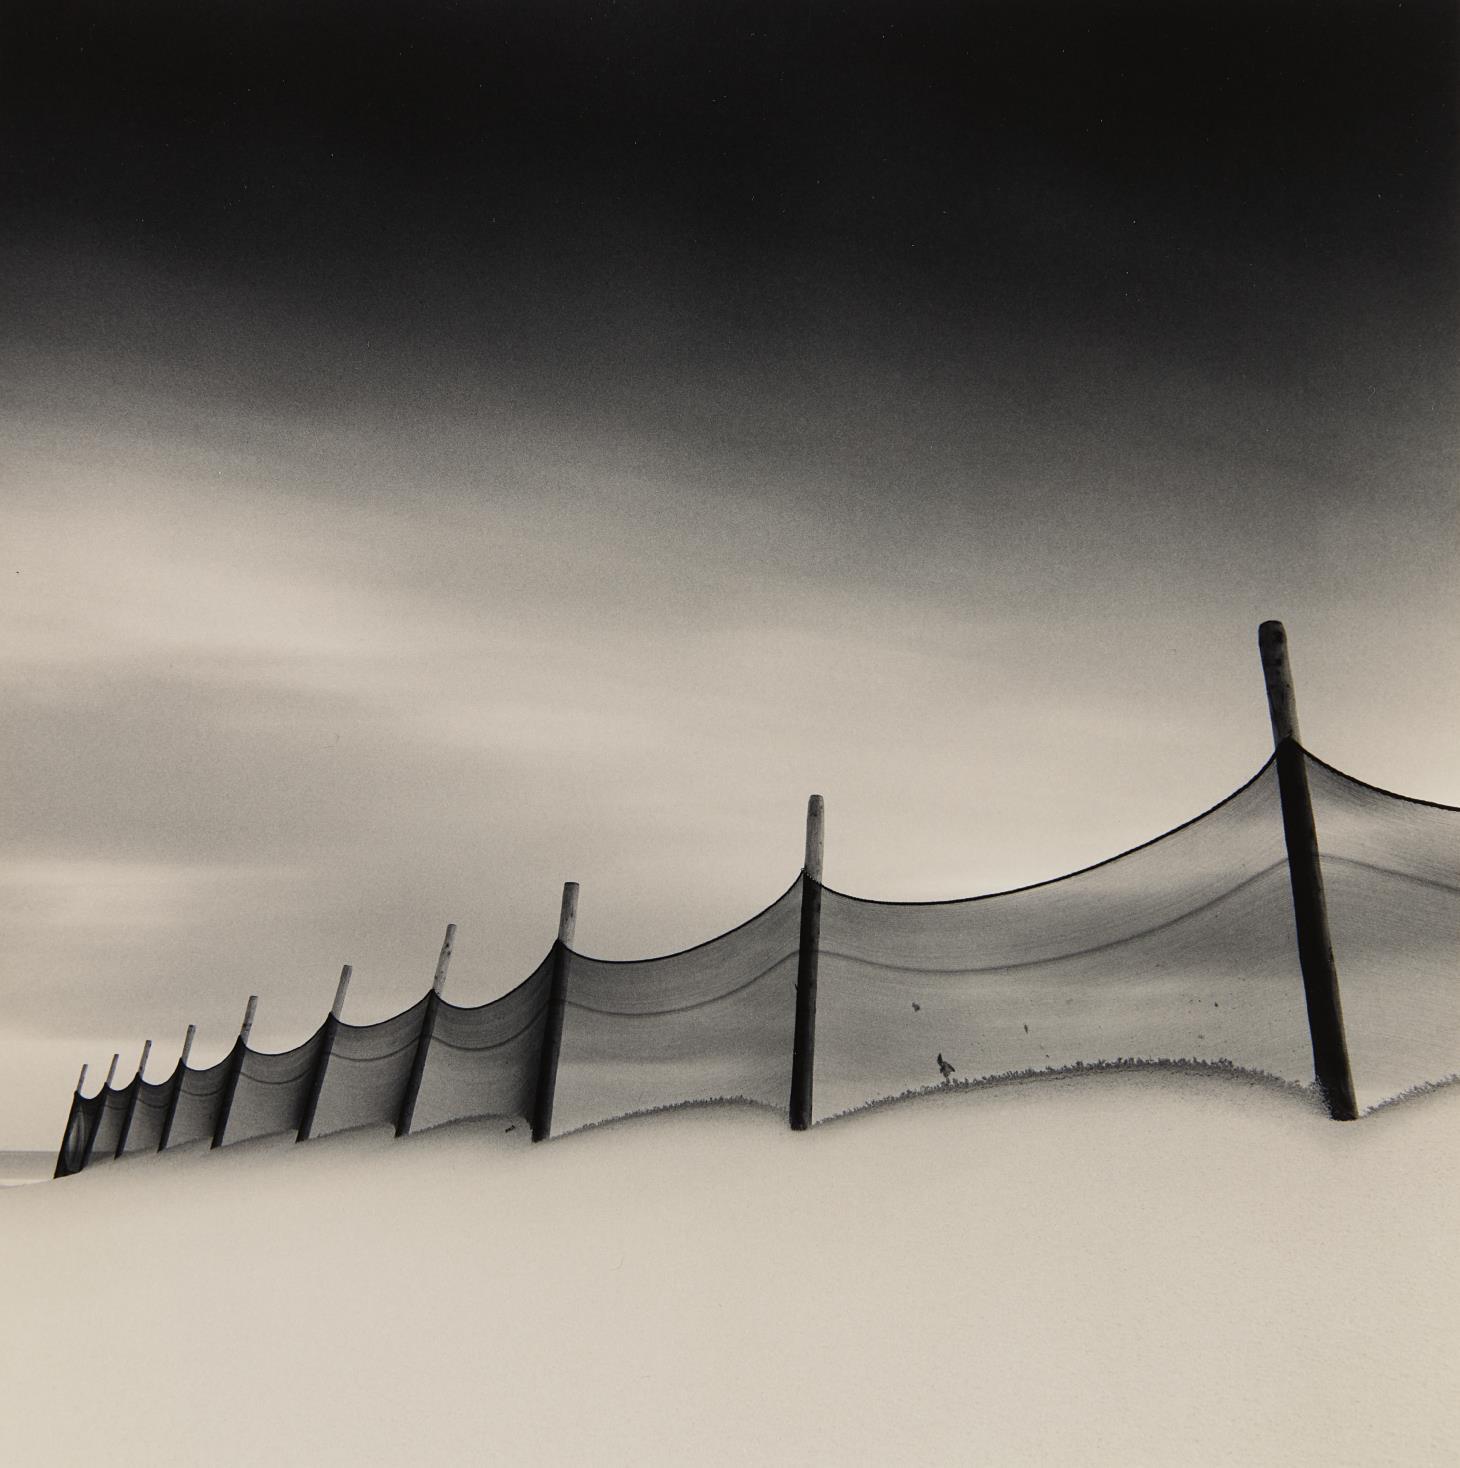 Michael Kenna-Wind-Swept Beach, Calais, France-1999